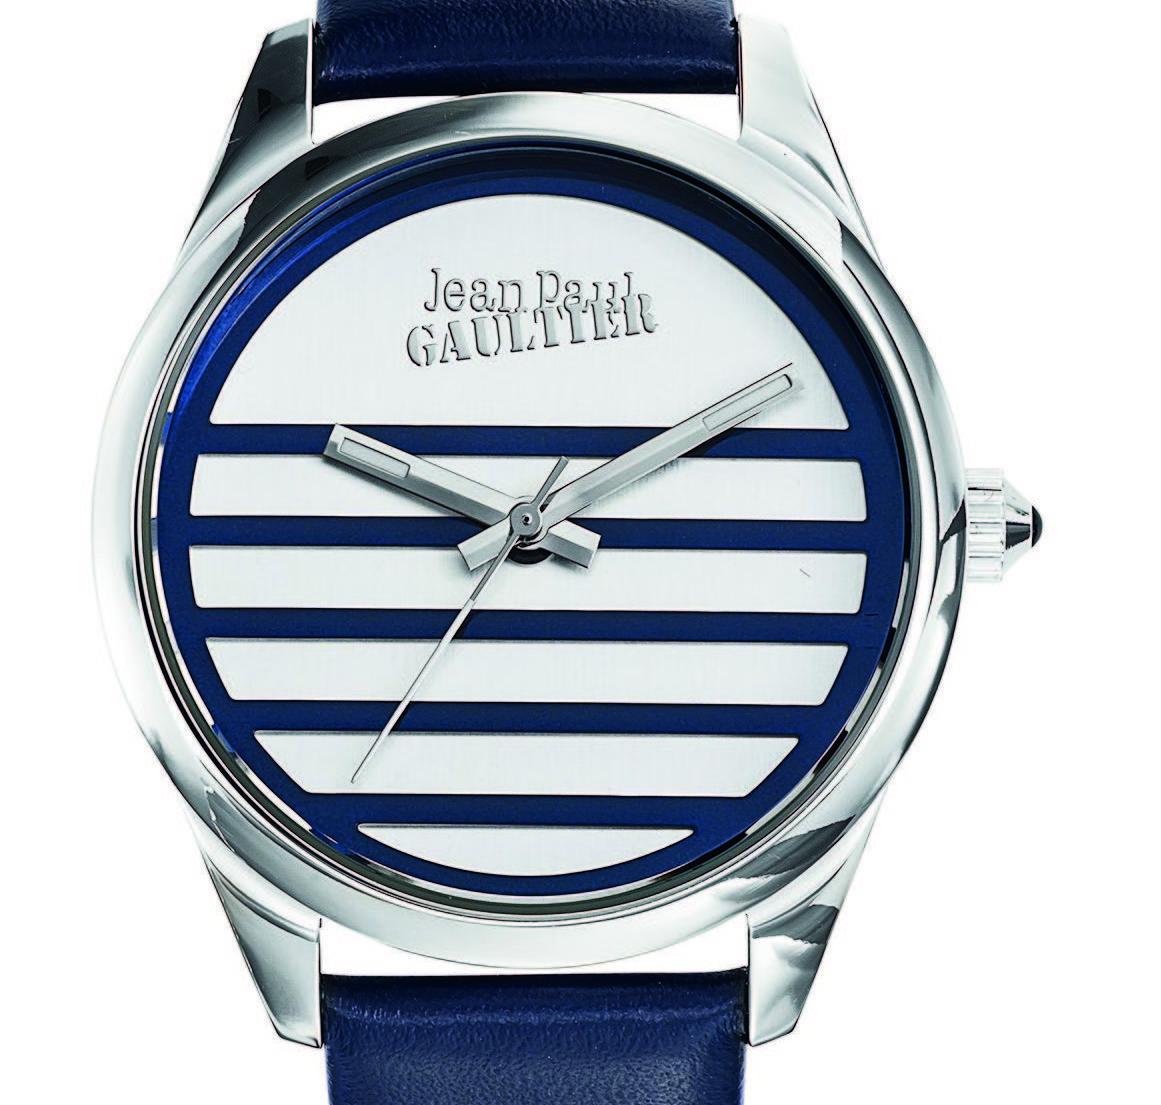 Jean Paul Gaultier watches (2)